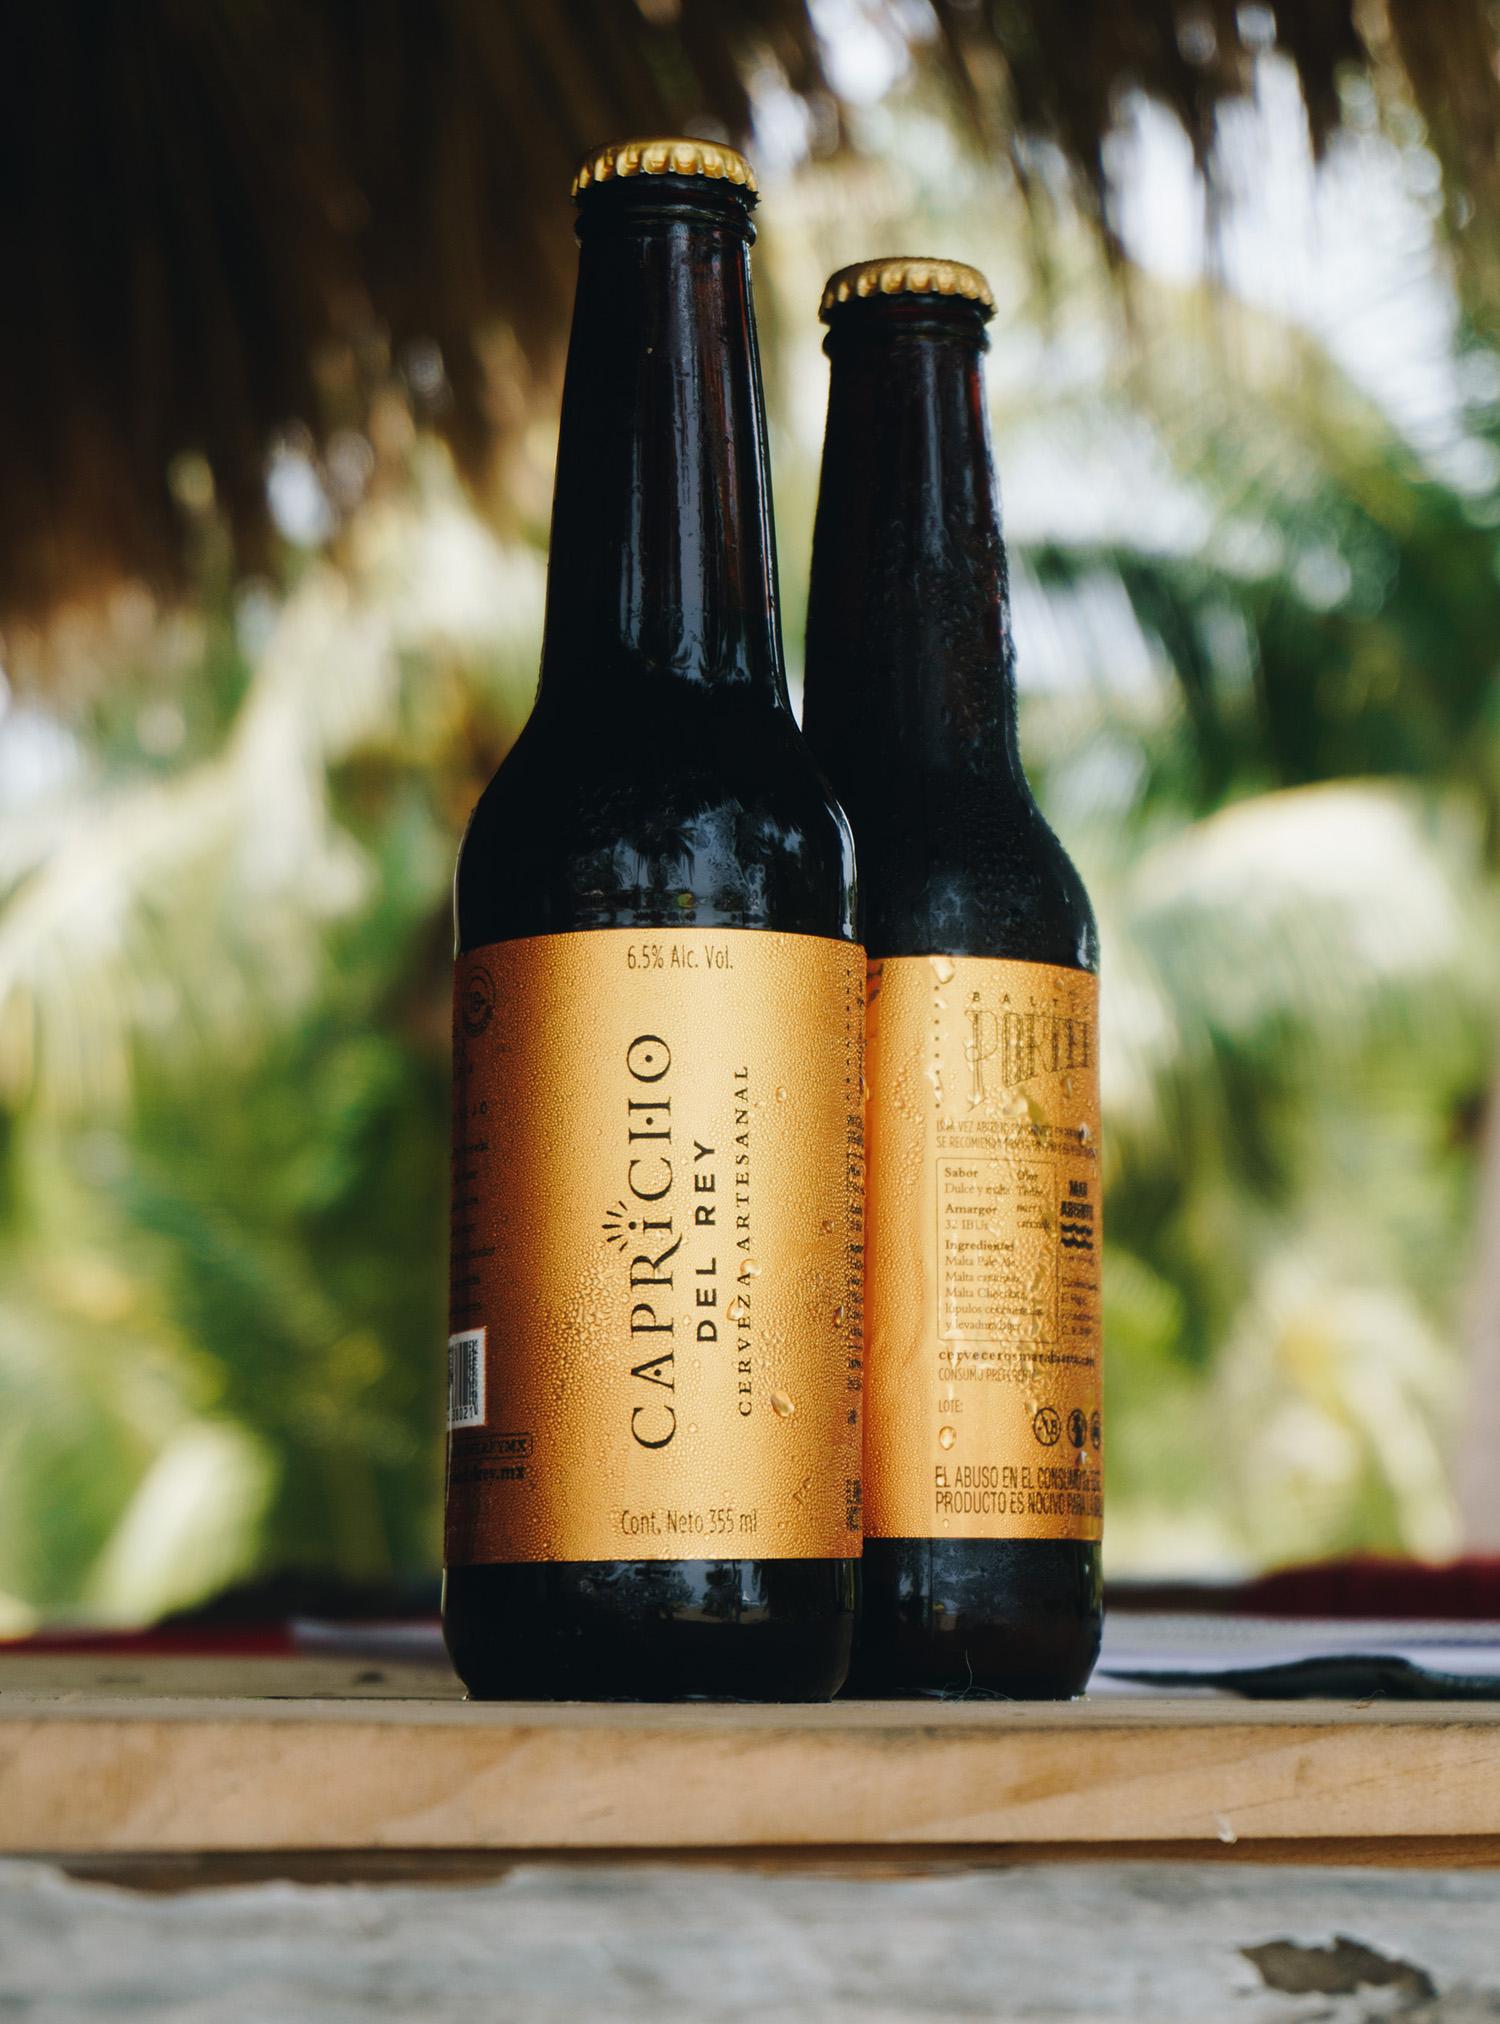 Capricho-Del-Rey-Cerveza-Ixtapa-Zihuatanejo-Fotografia-Heiko-Bothe-3.jpg